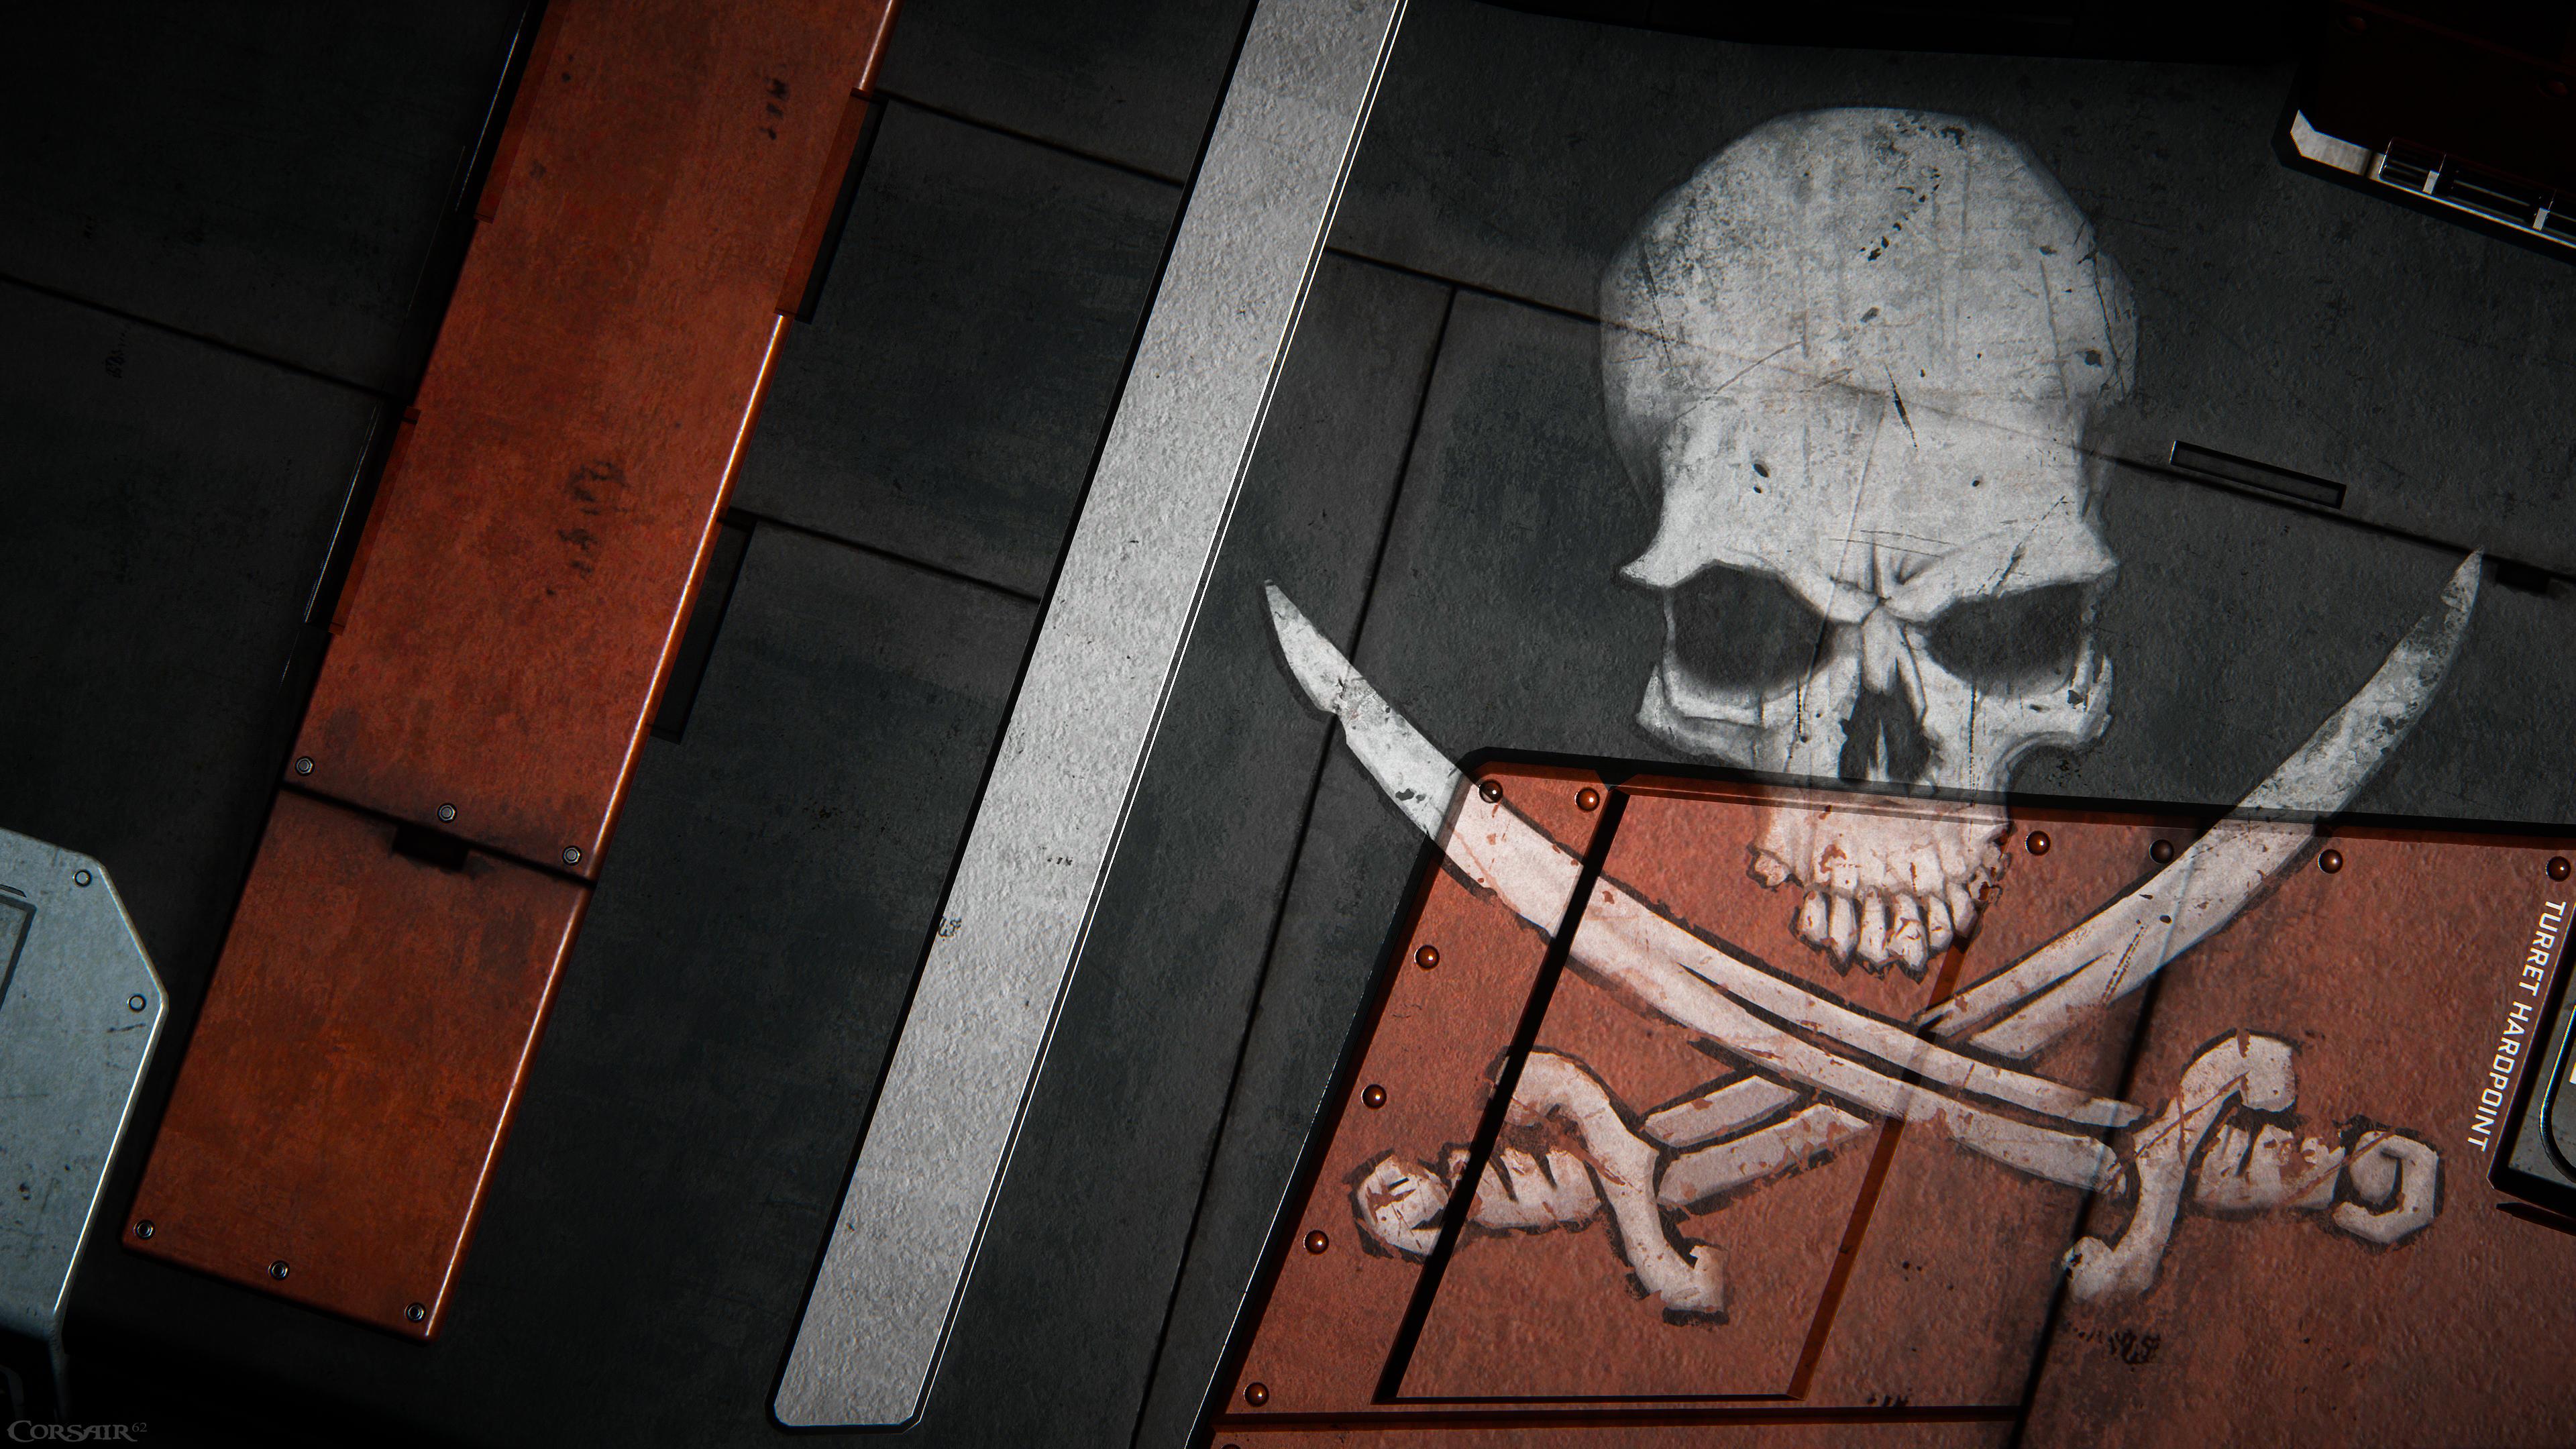 star citizen skull and cutlusses 4k 1537690905 - Star Citizen Skull And Cutlusses 4k - star citizen wallpapers, skull wallpapers, pc games wallpapers, hd-wallpapers, games wallpapers, 4k-wallpapers, 2018 games wallpapers